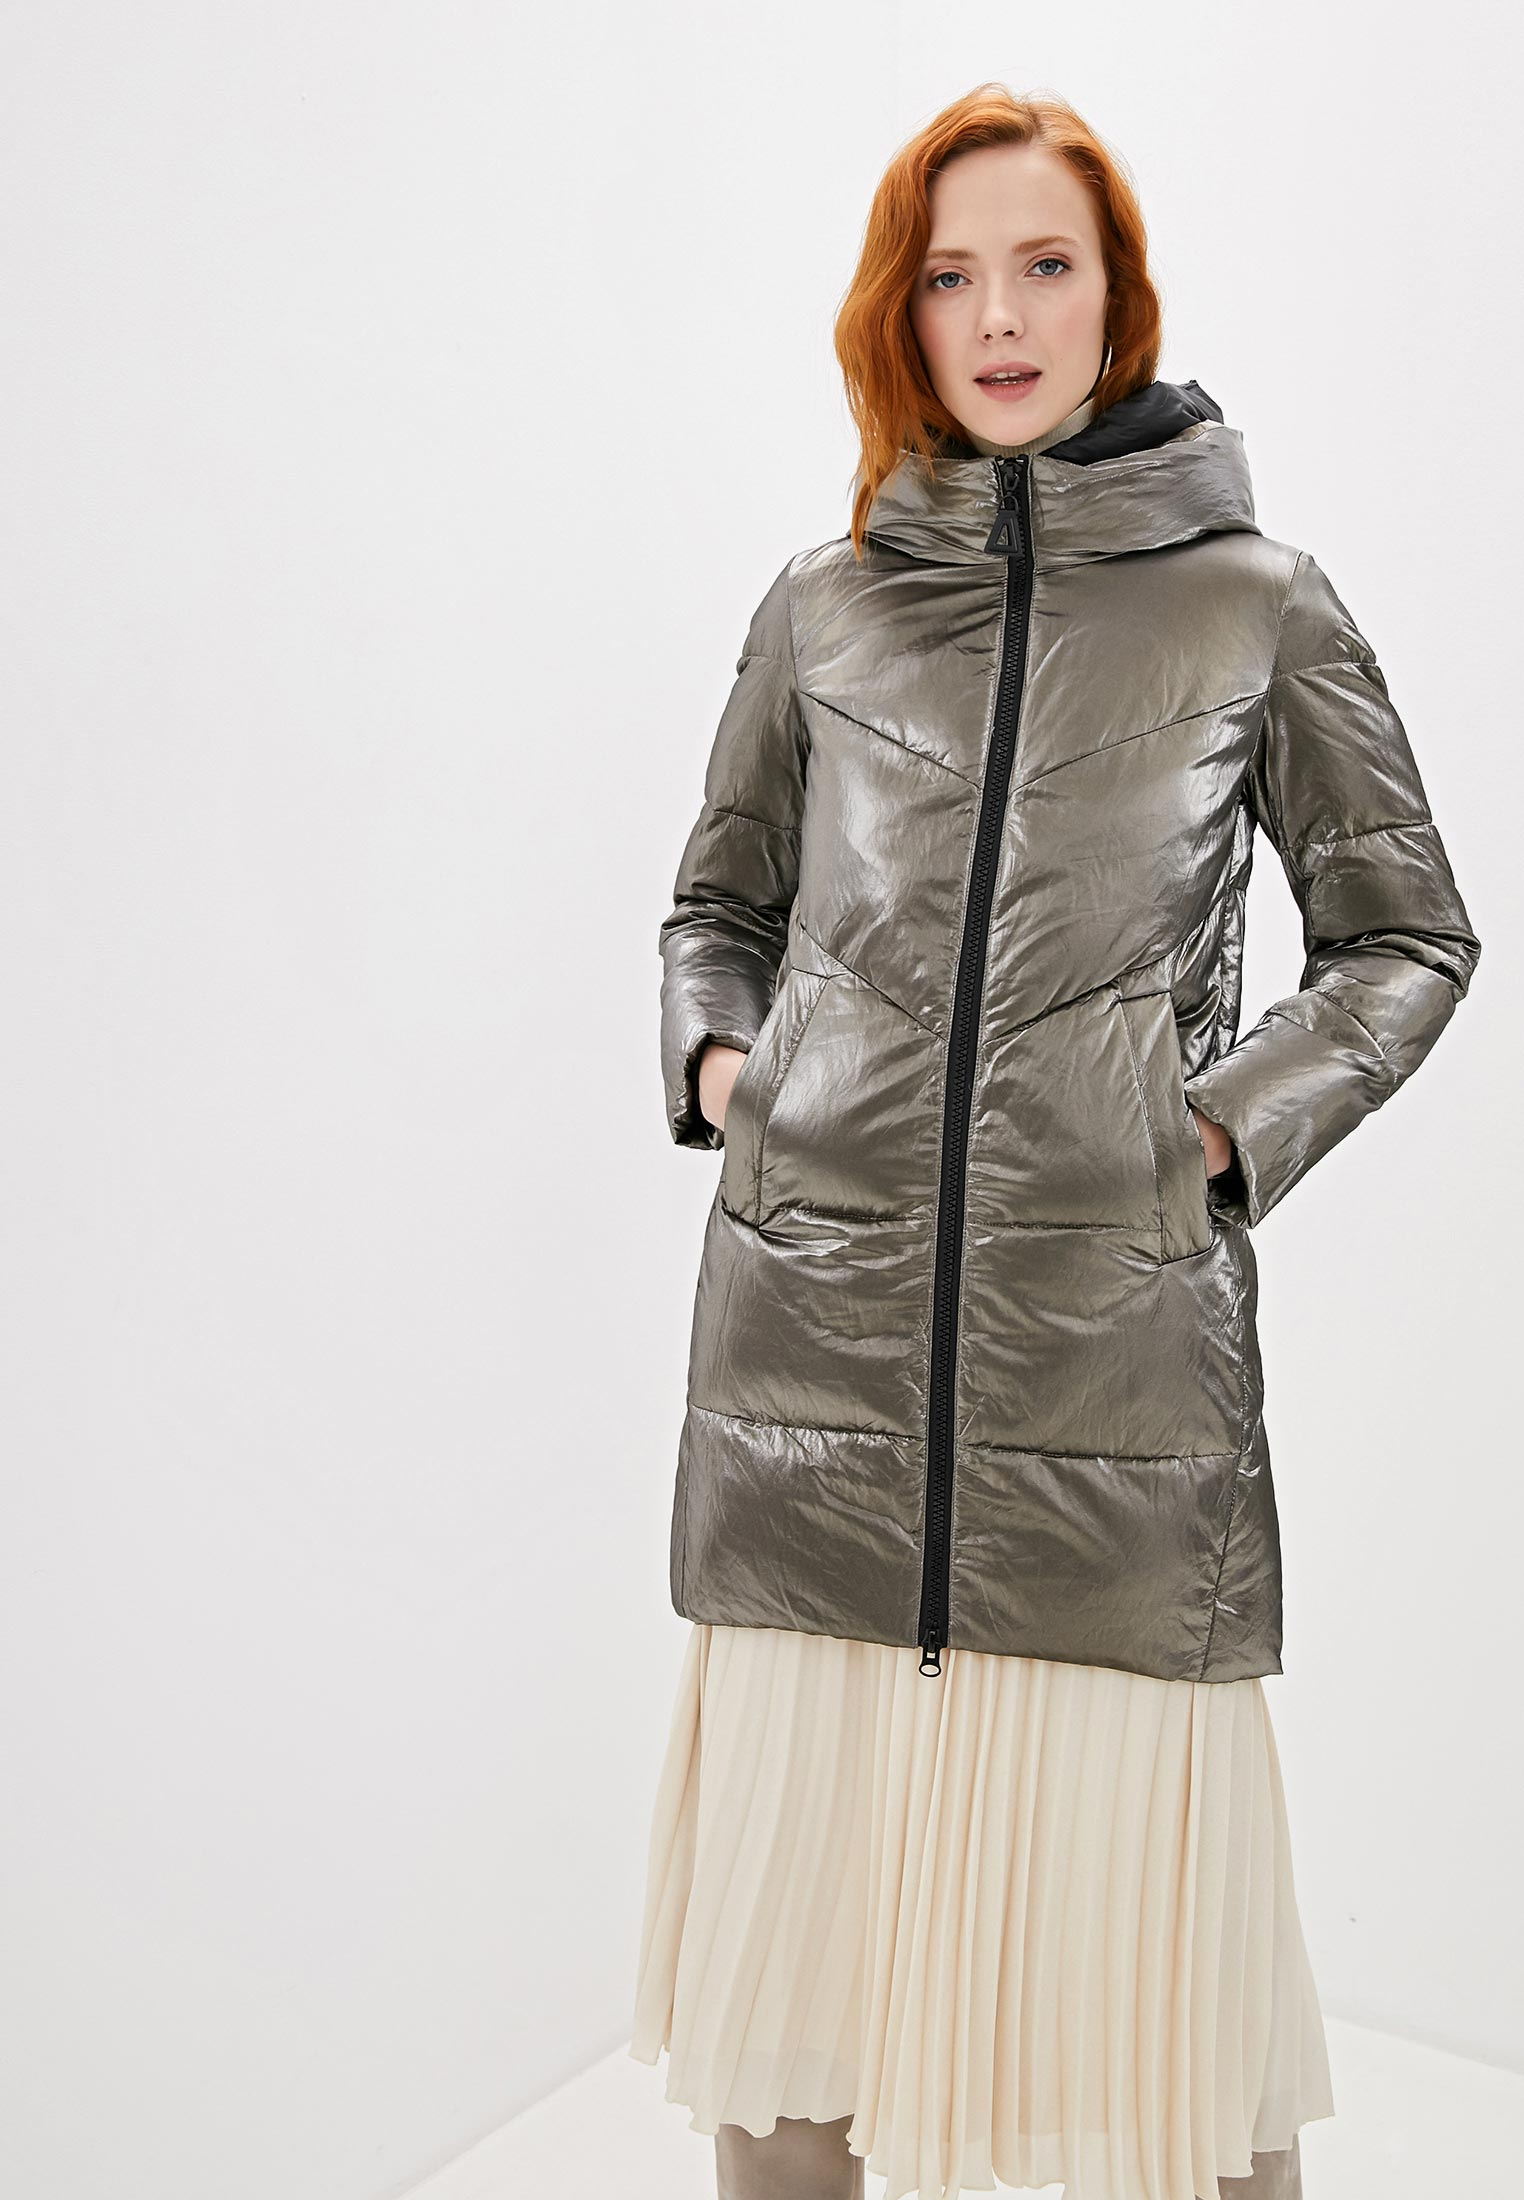 Куртка утепленная, Marco Bonne`, цвет: серебряный. Артикул: MP002XW1BX3G. Одежда / Верхняя одежда